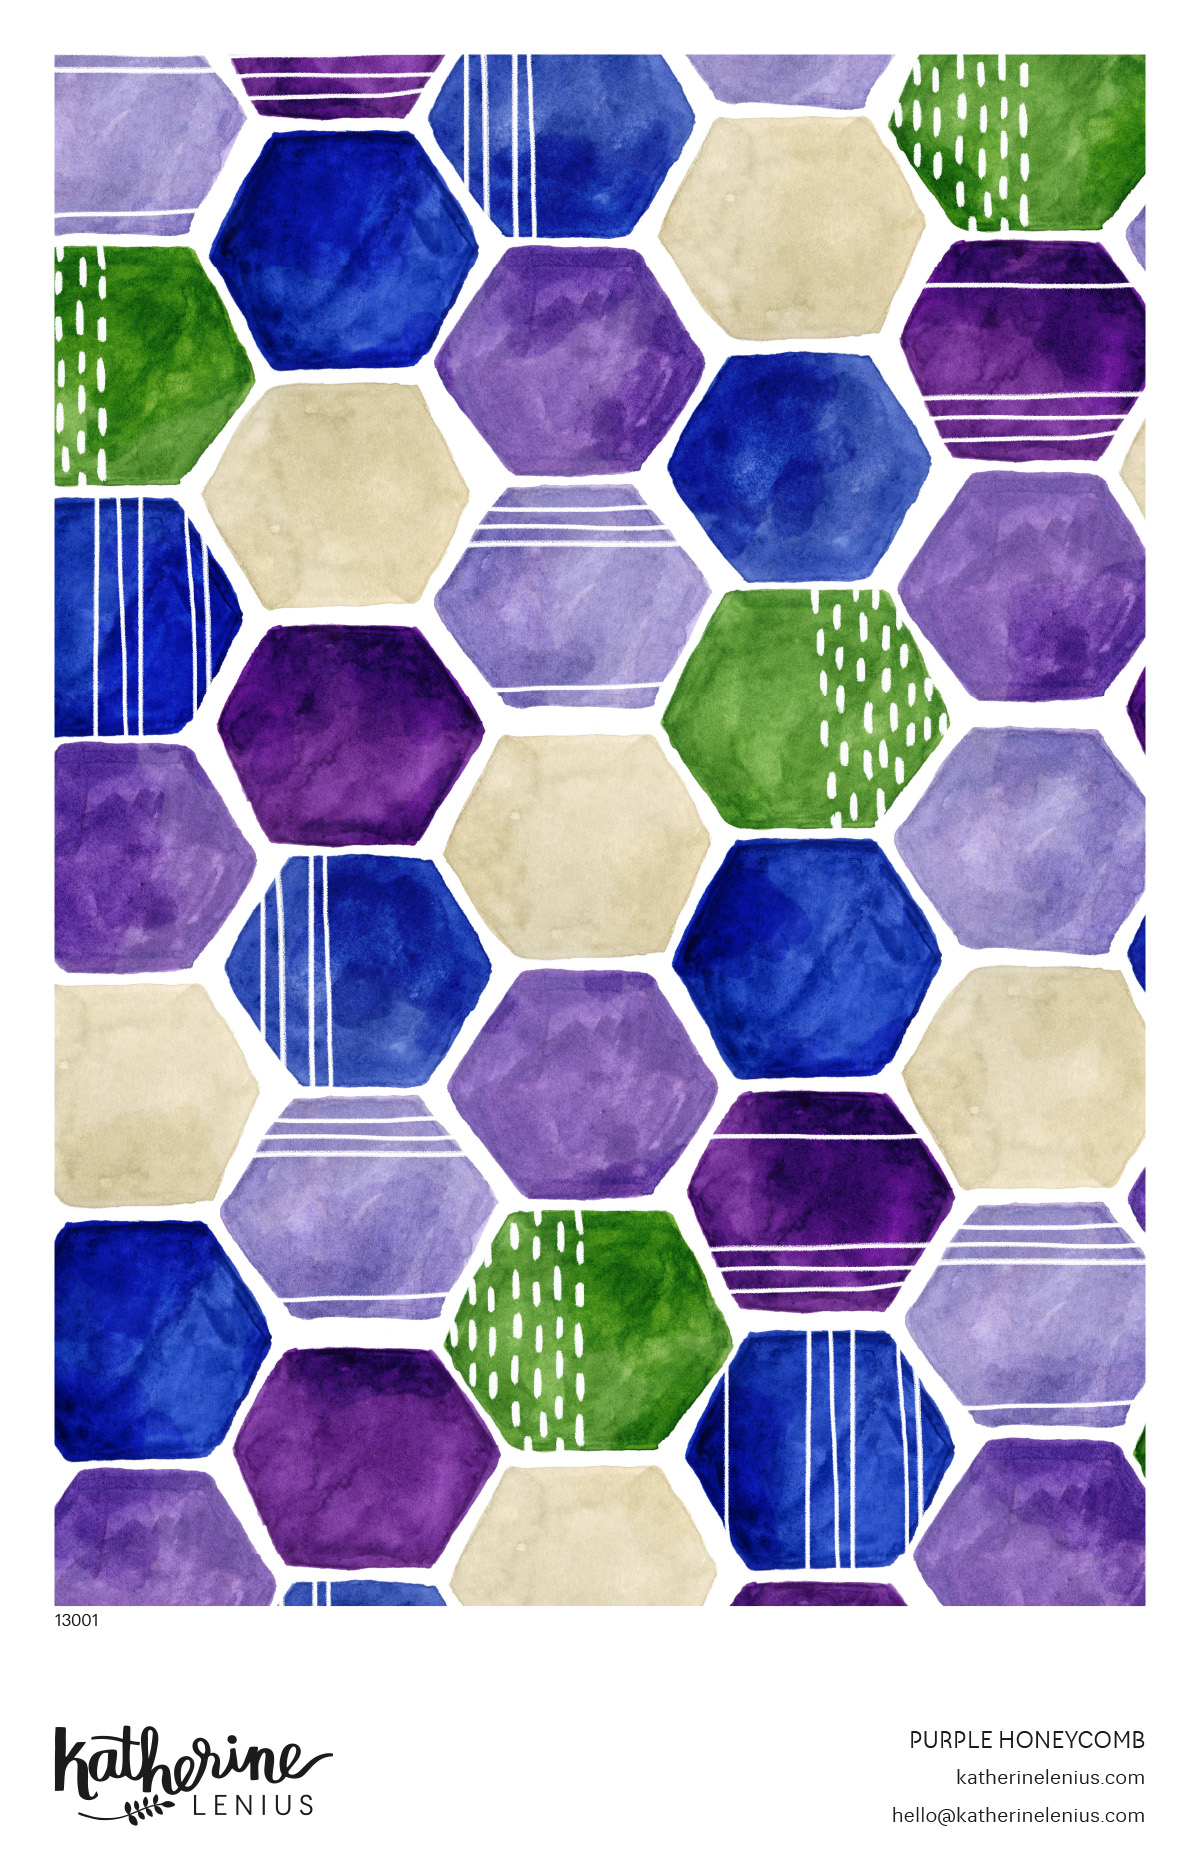 KL_13001_Purple Honeycomb copy.jpg